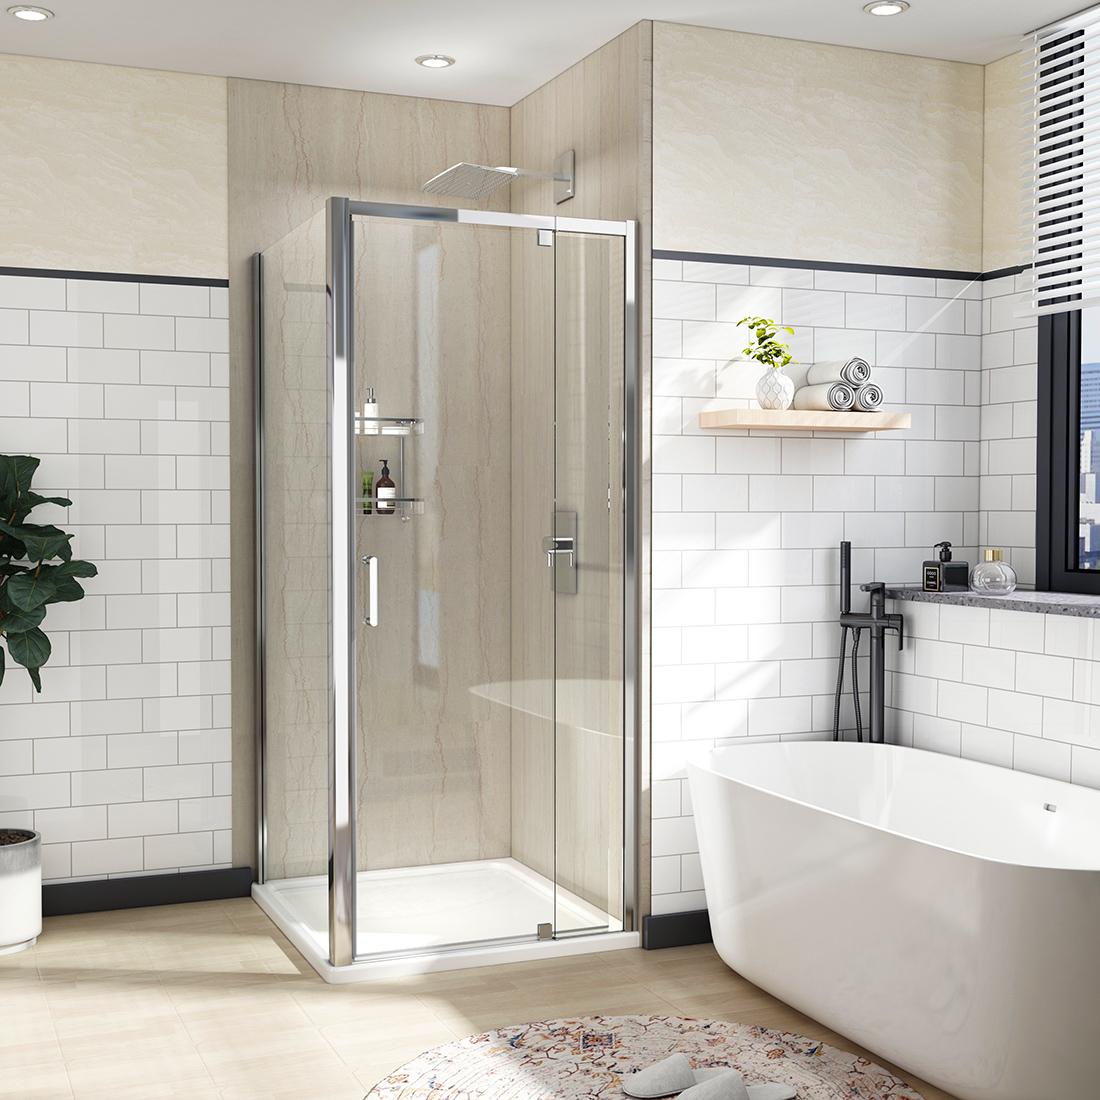 Details About 36 X 72 Framed Pivot Shower Door Screen Enclosure 1 4 Clear Glass Chrome